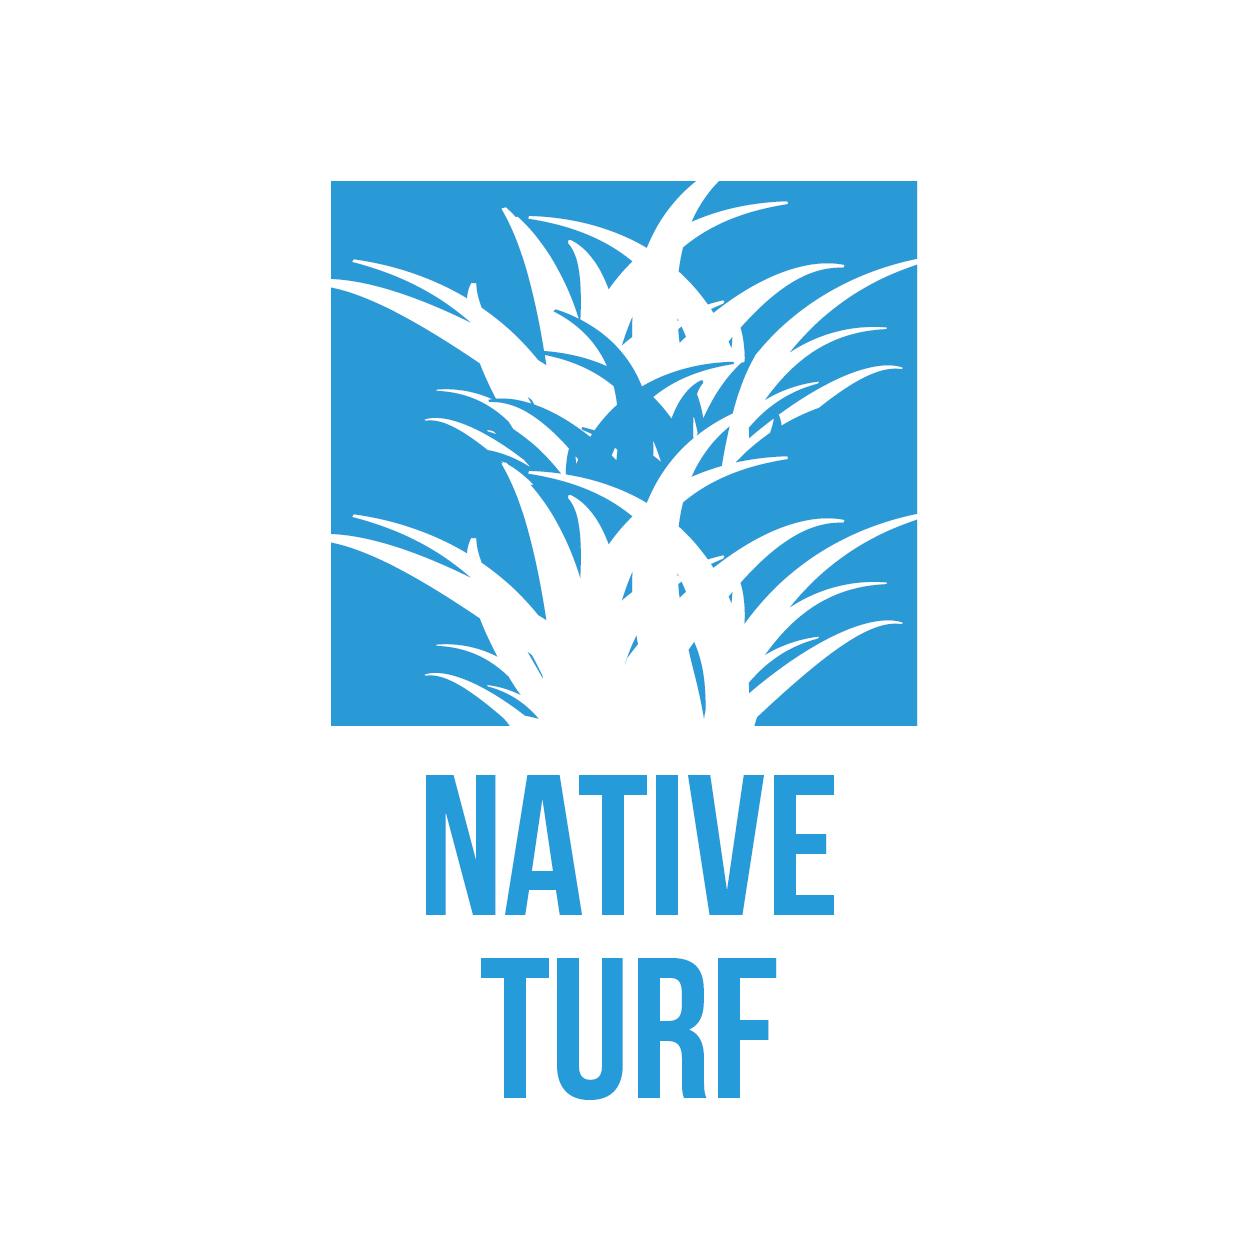 icon-nativeturf-square.jpg